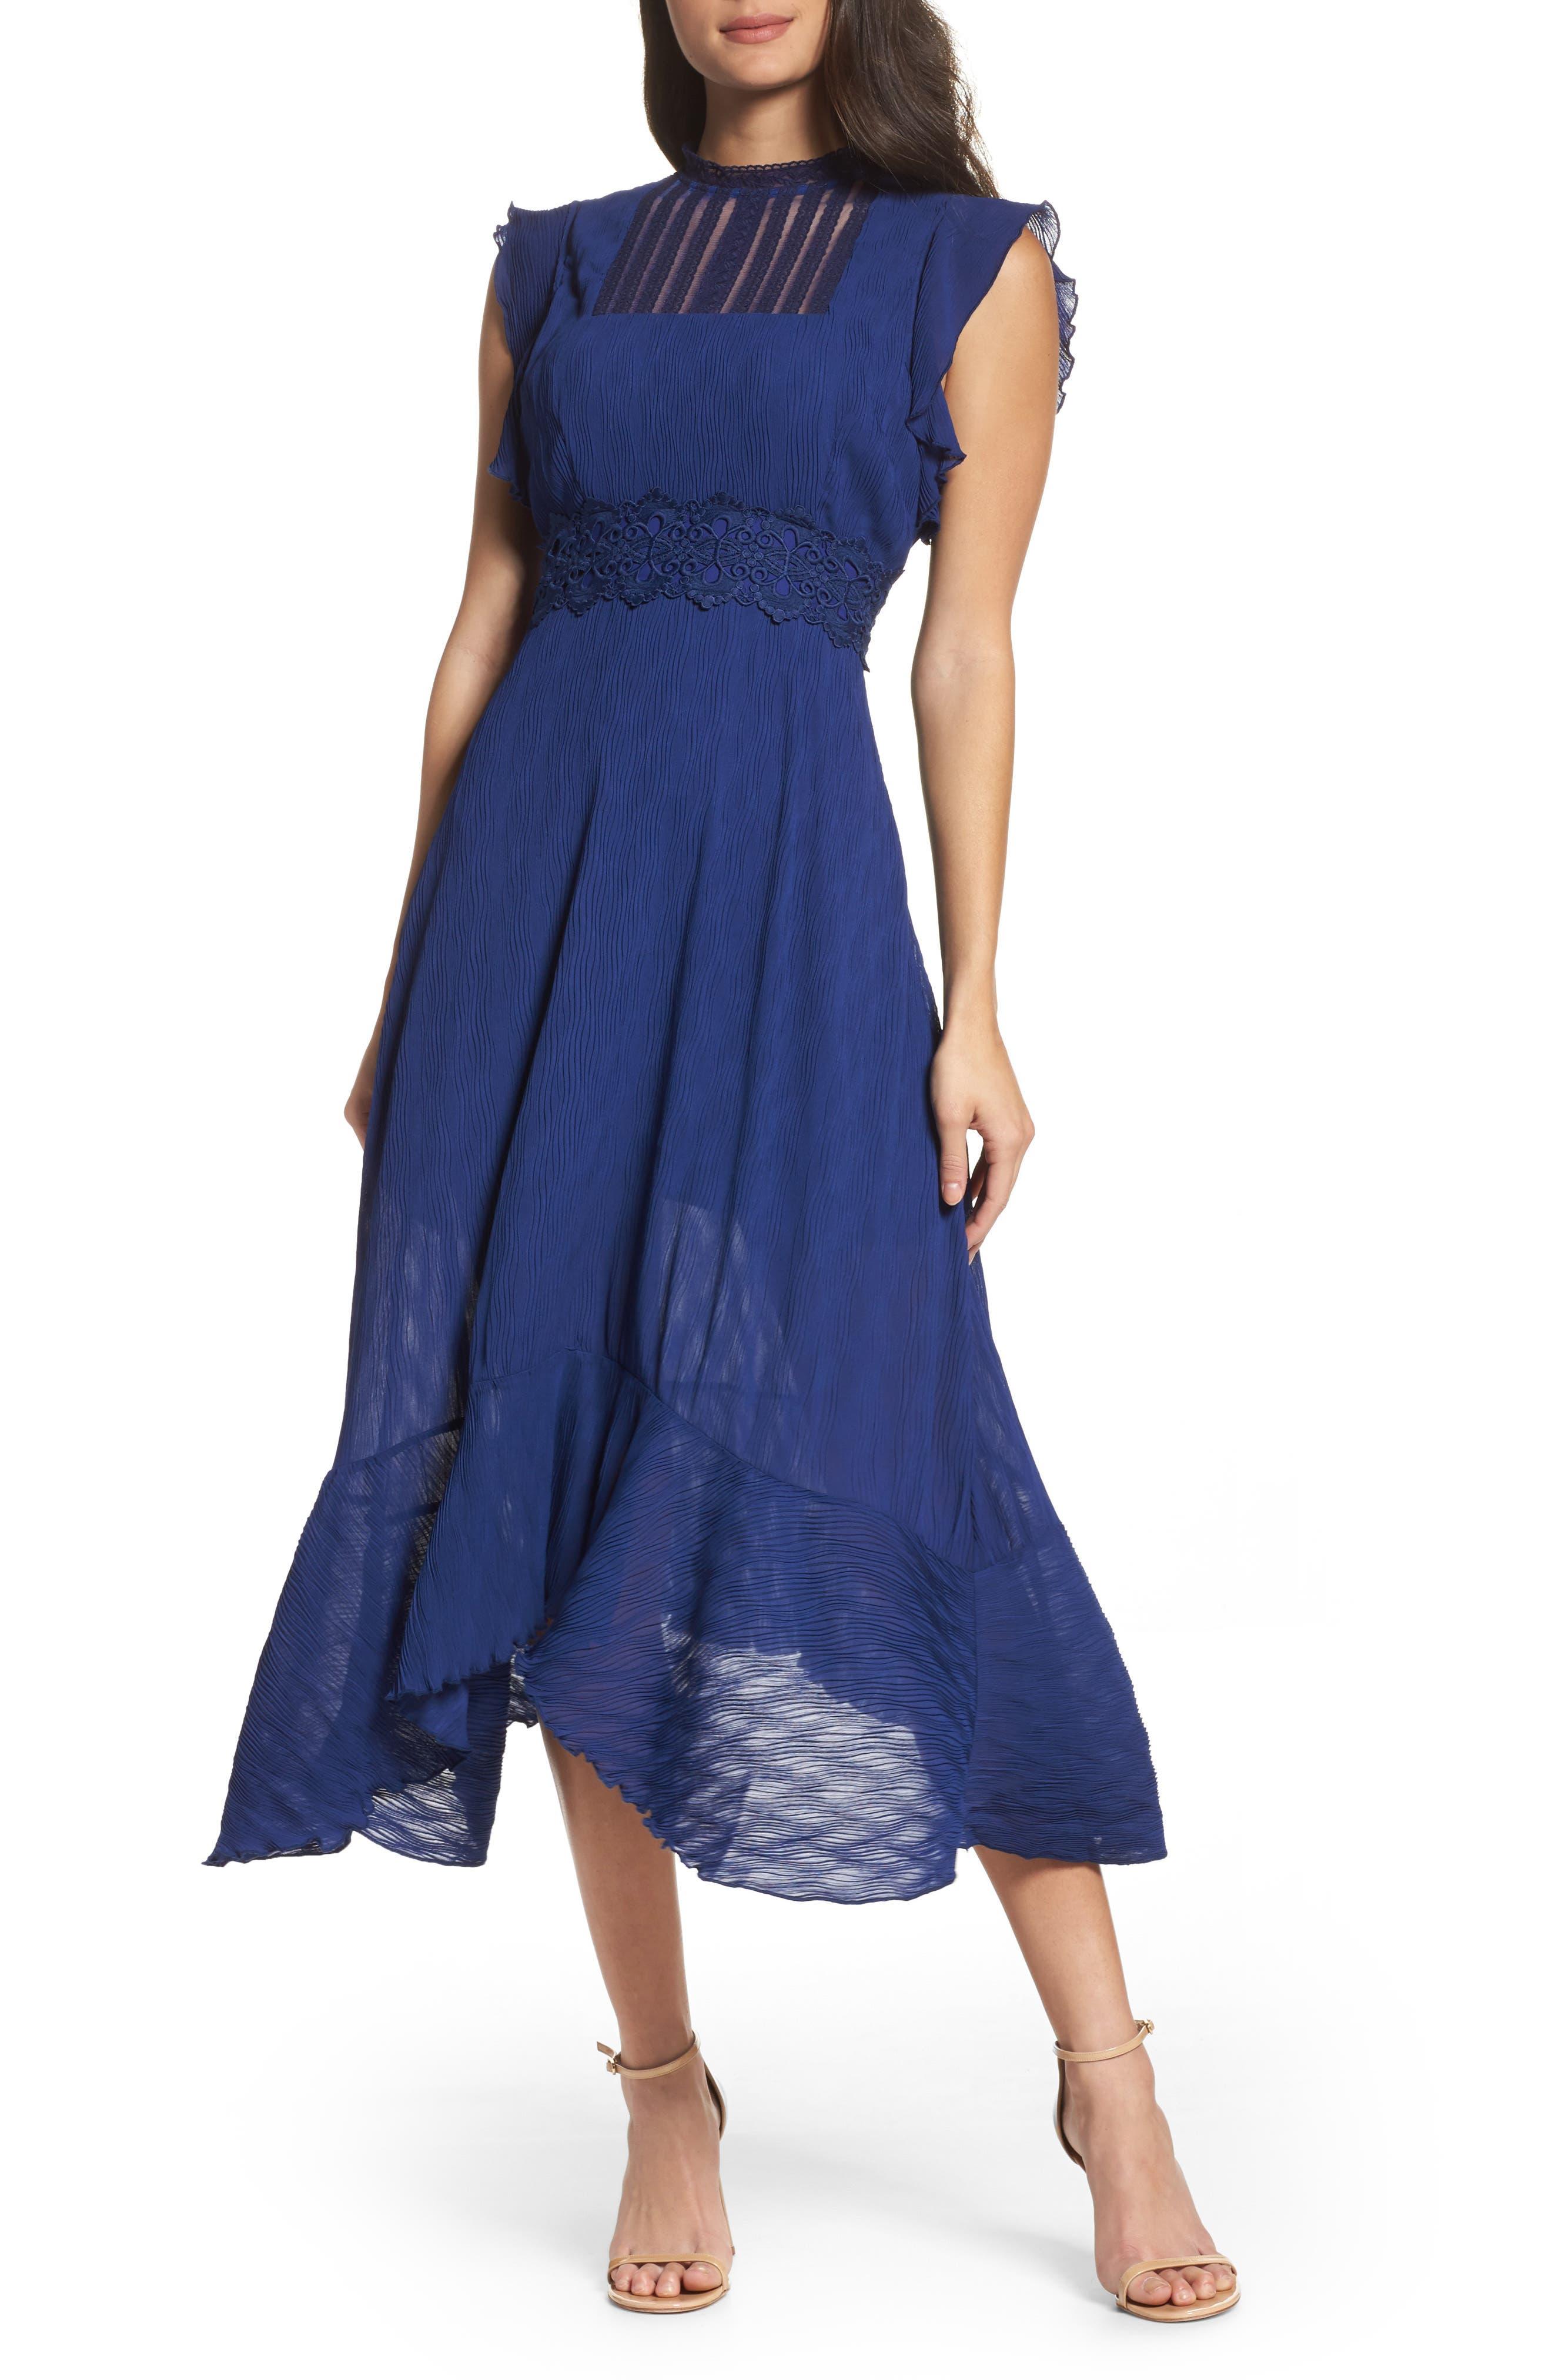 Main Image - Foxiedox Isadora Lace Trim Pintuck Midi Dress